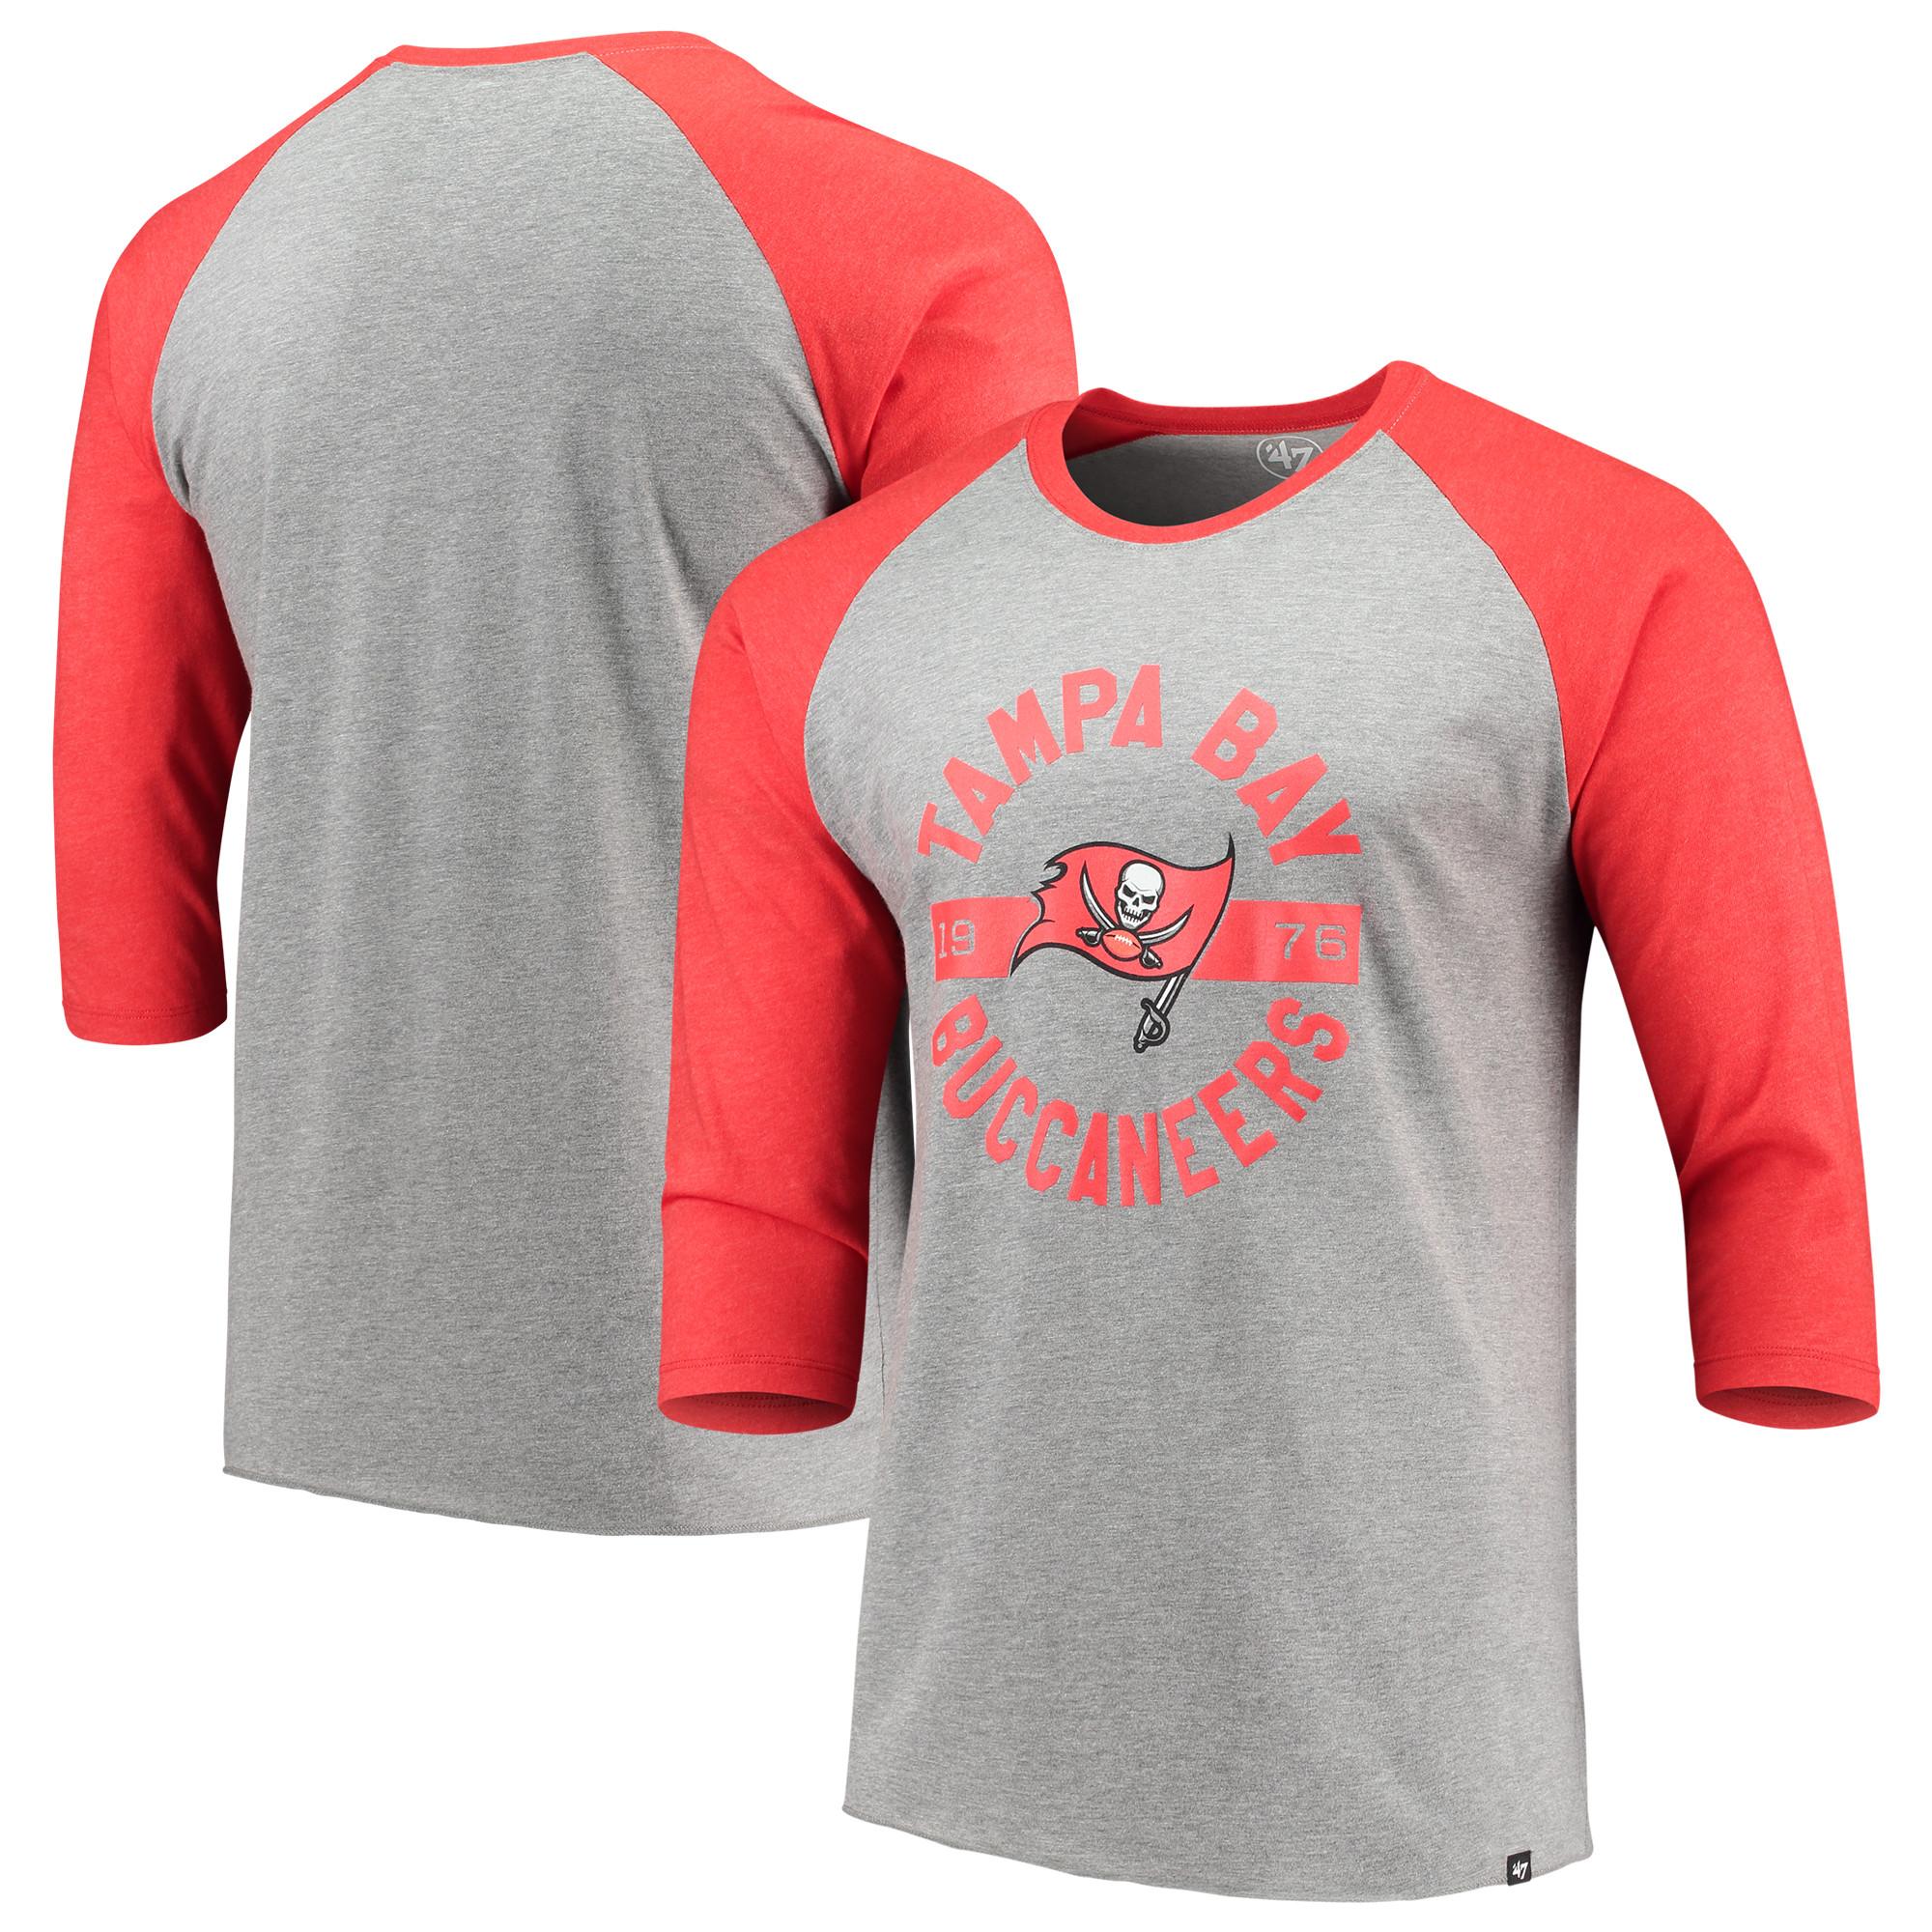 Tampa Bay Buccaneers '47 Roundabout Club Raglan 3/4-Sleeve T-Shirt - Gray/Red